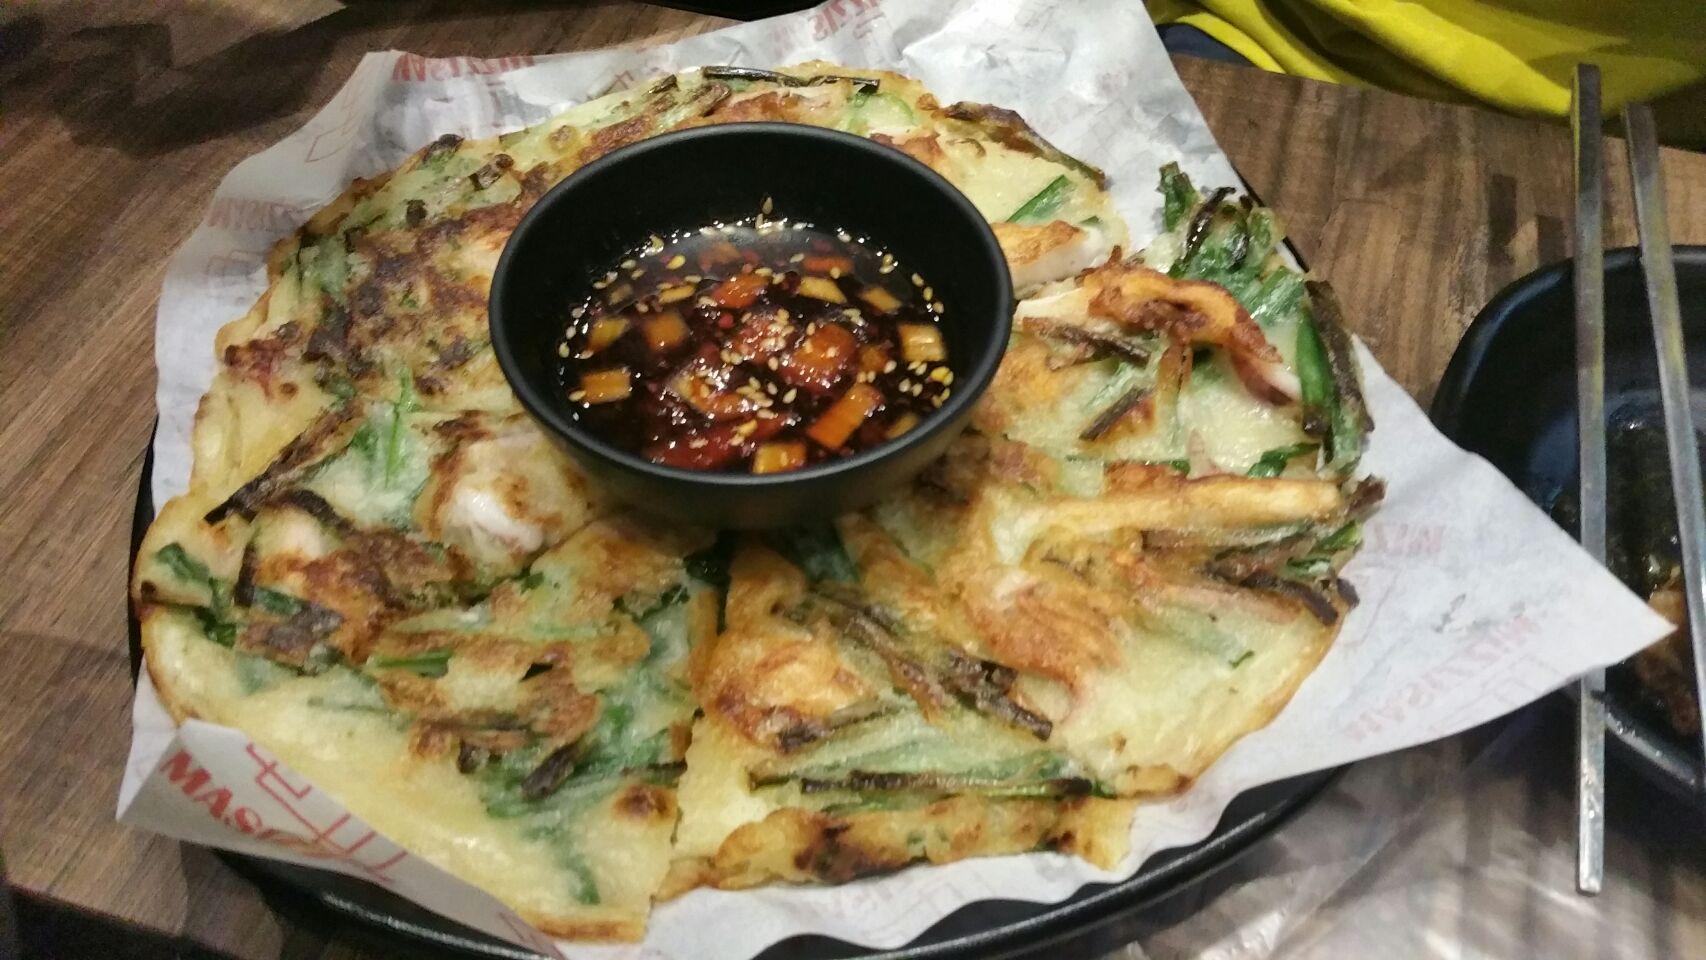 Squid And Leek Pancake 14.8++